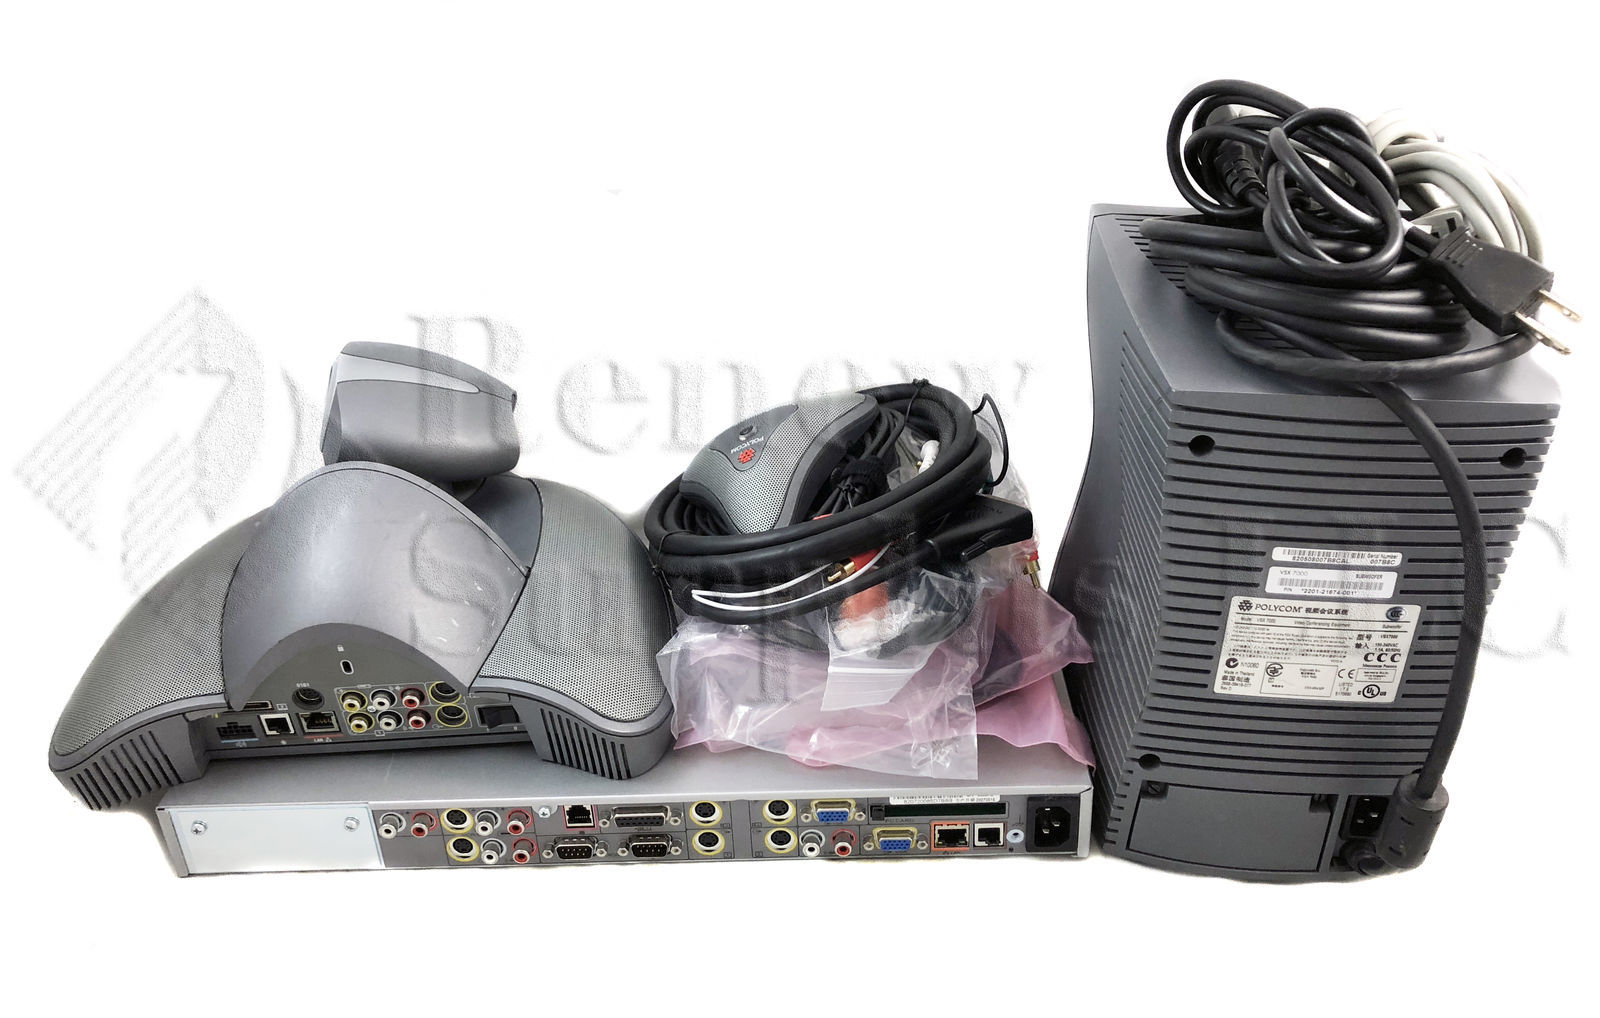 Polycom VSX 7000 Camera Module Video Conferencing System Excl PSU